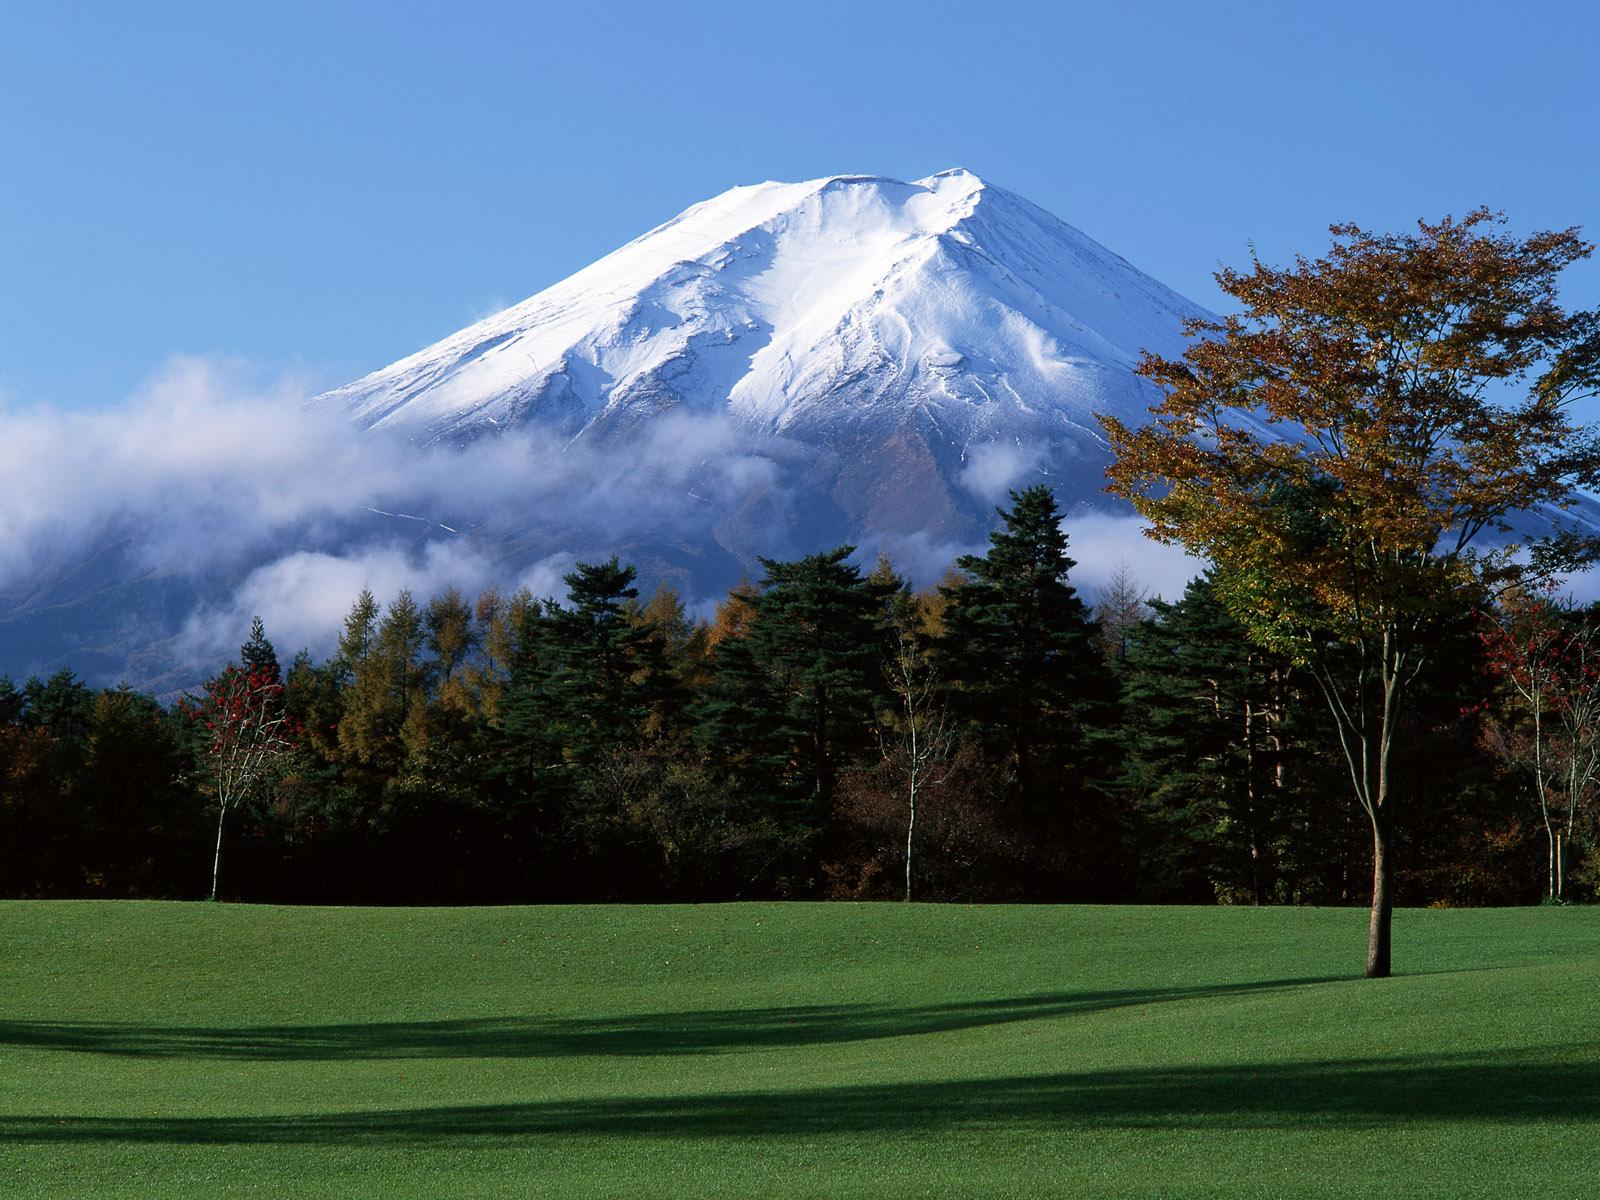 http://2.bp.blogspot.com/_k_uZrx7p3sM/TPEz05fszvI/AAAAAAAAANA/23dXyBnAyY0/s1600/fuji_mountain_1600x1200.jpg